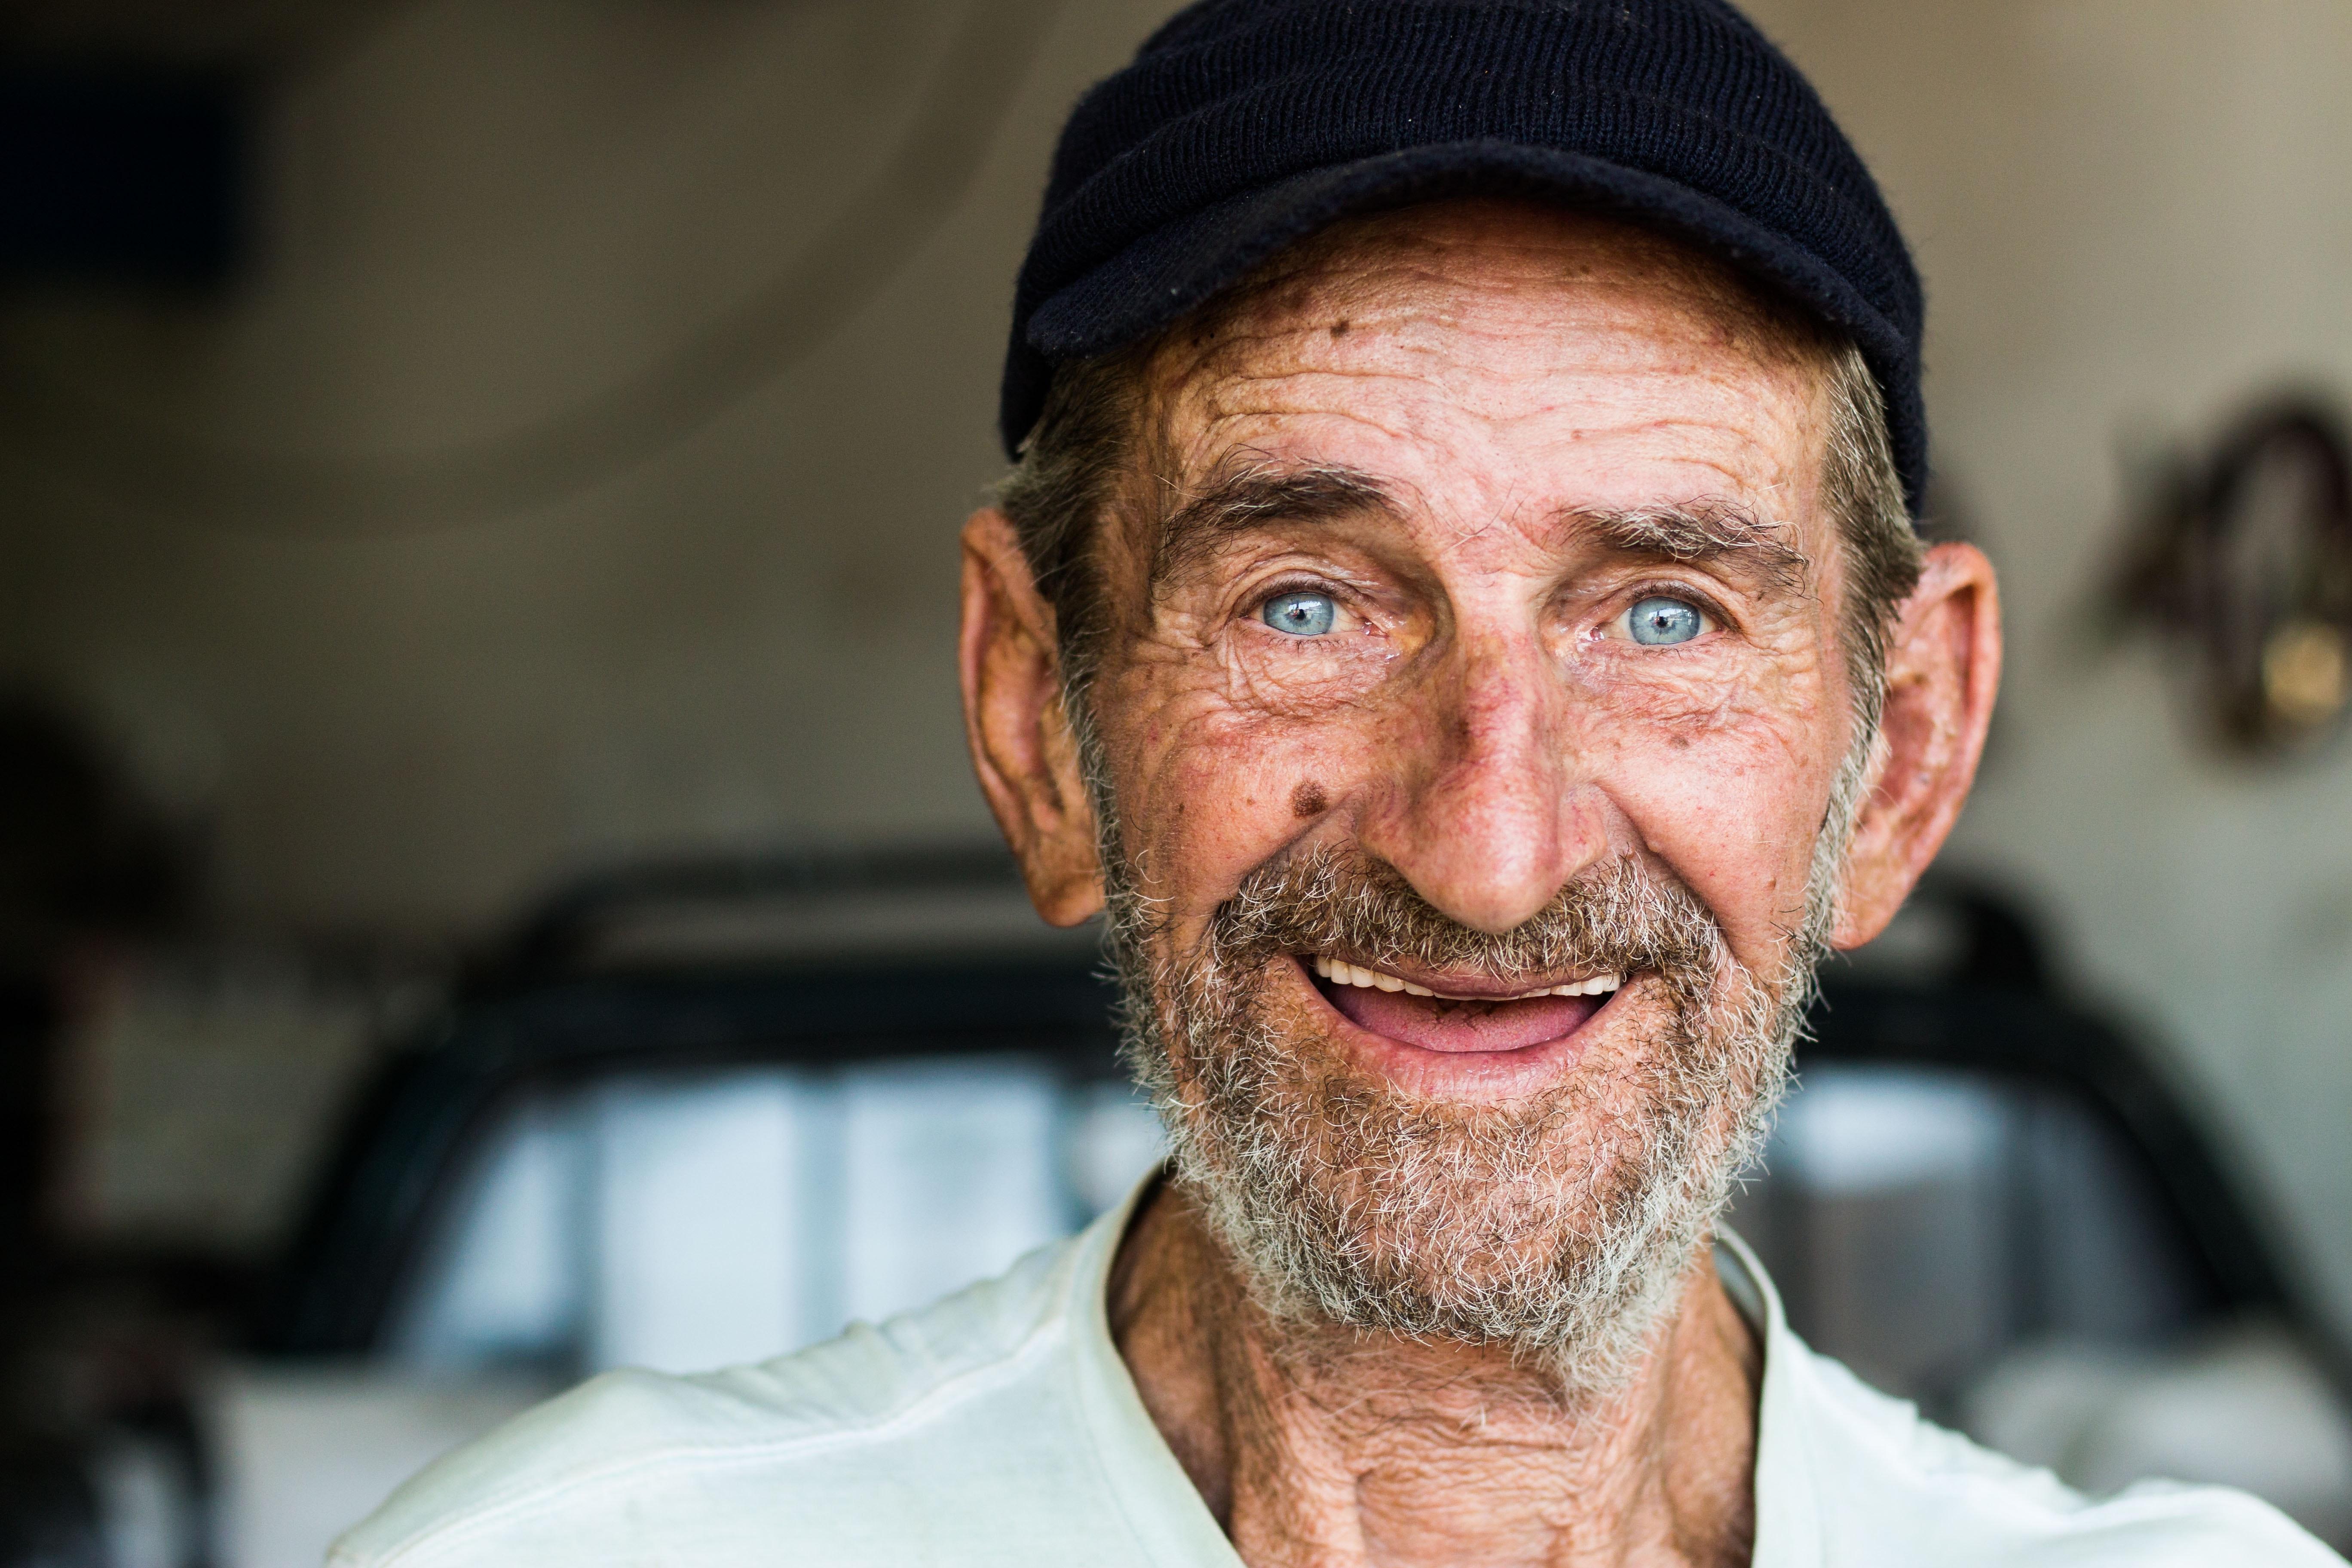 Free Images Actor Adult Beard Blue Eyes Blur Close Up Elder